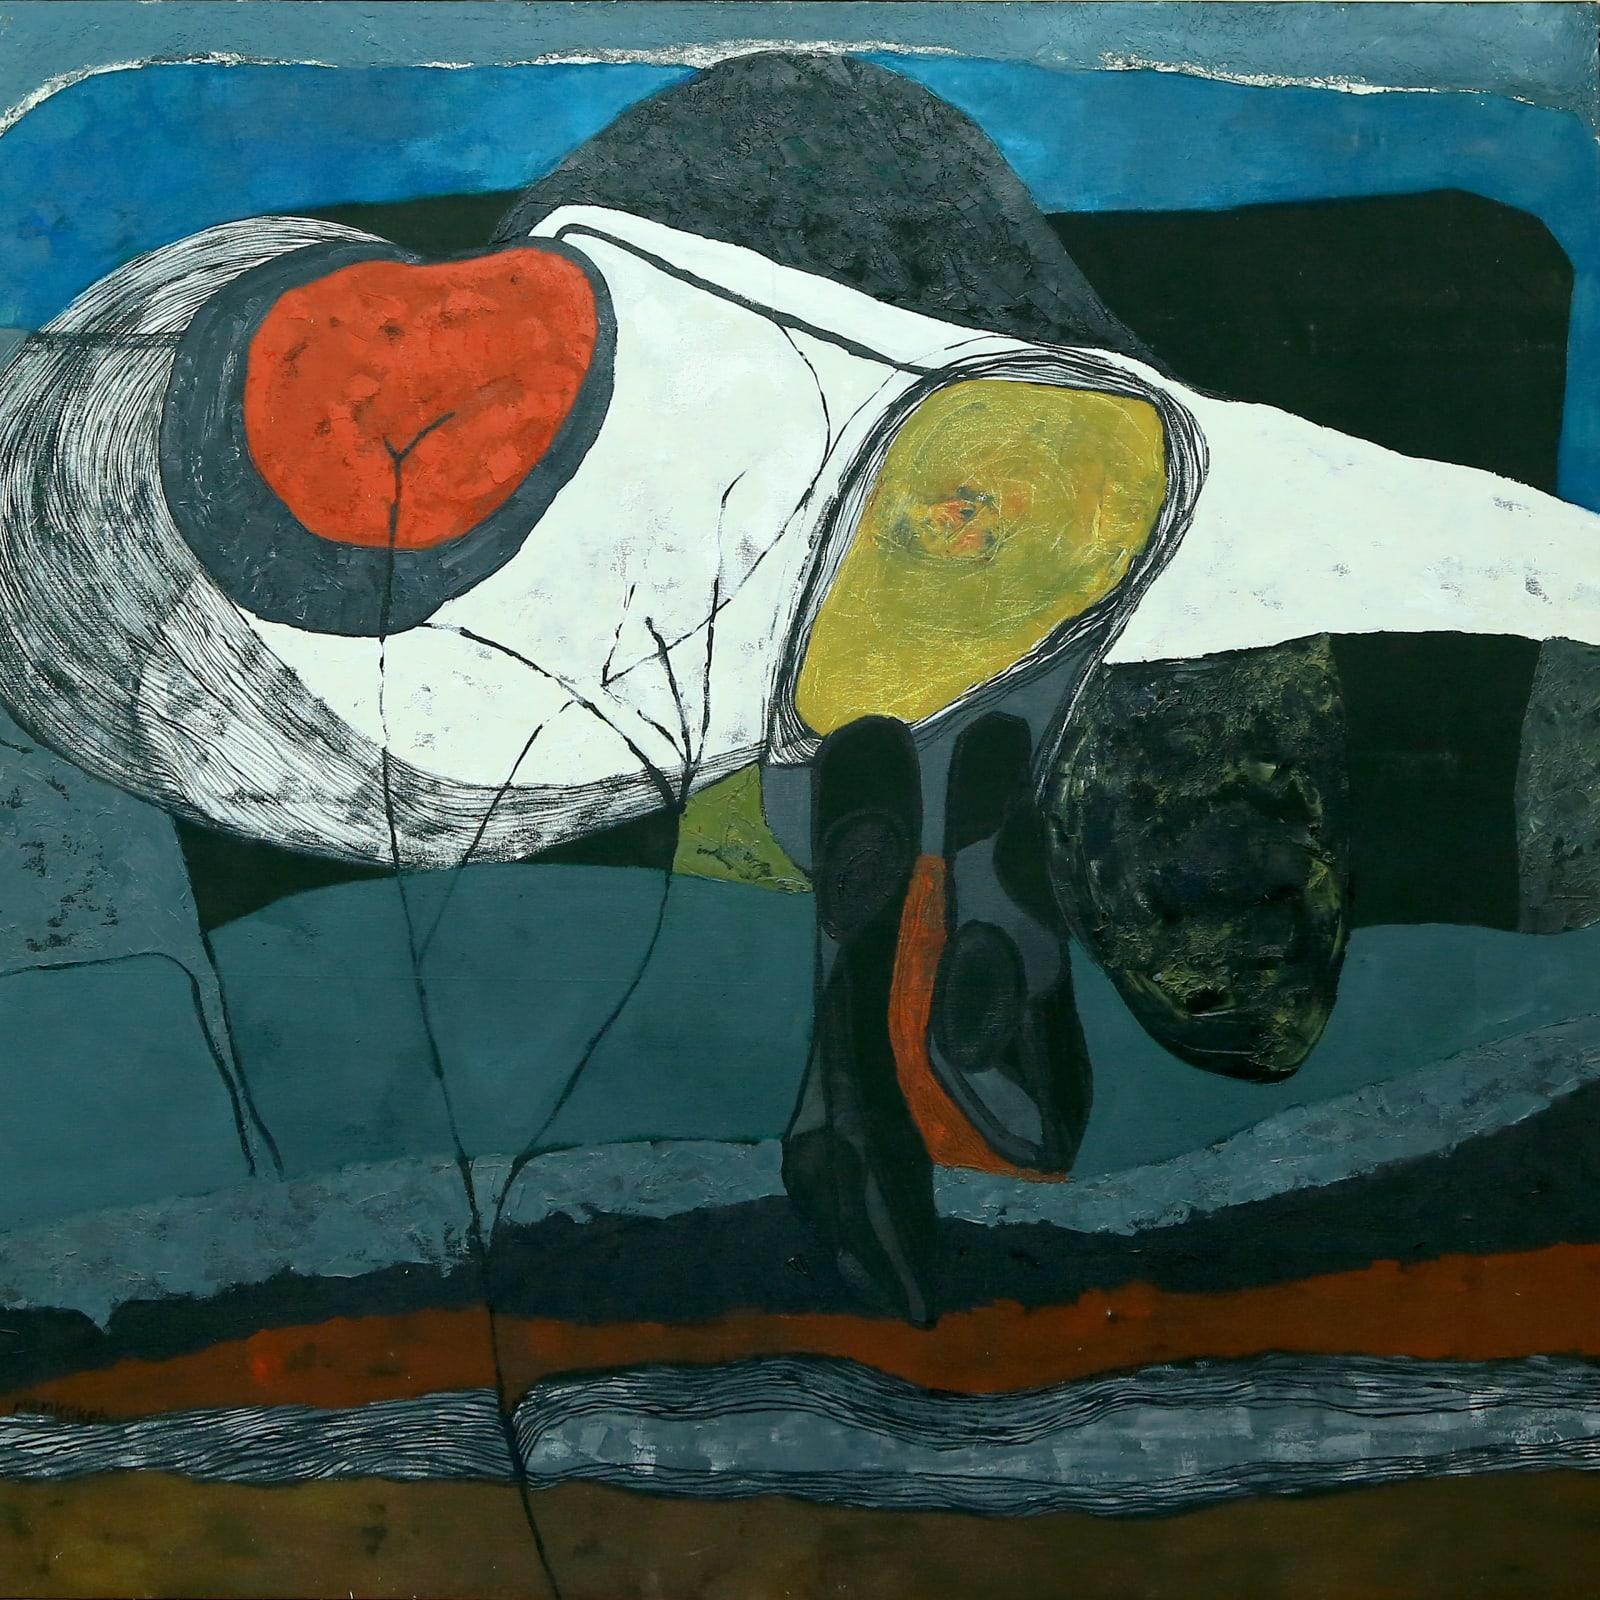 Merikokeb Berhanu, Untitled 8, 2010